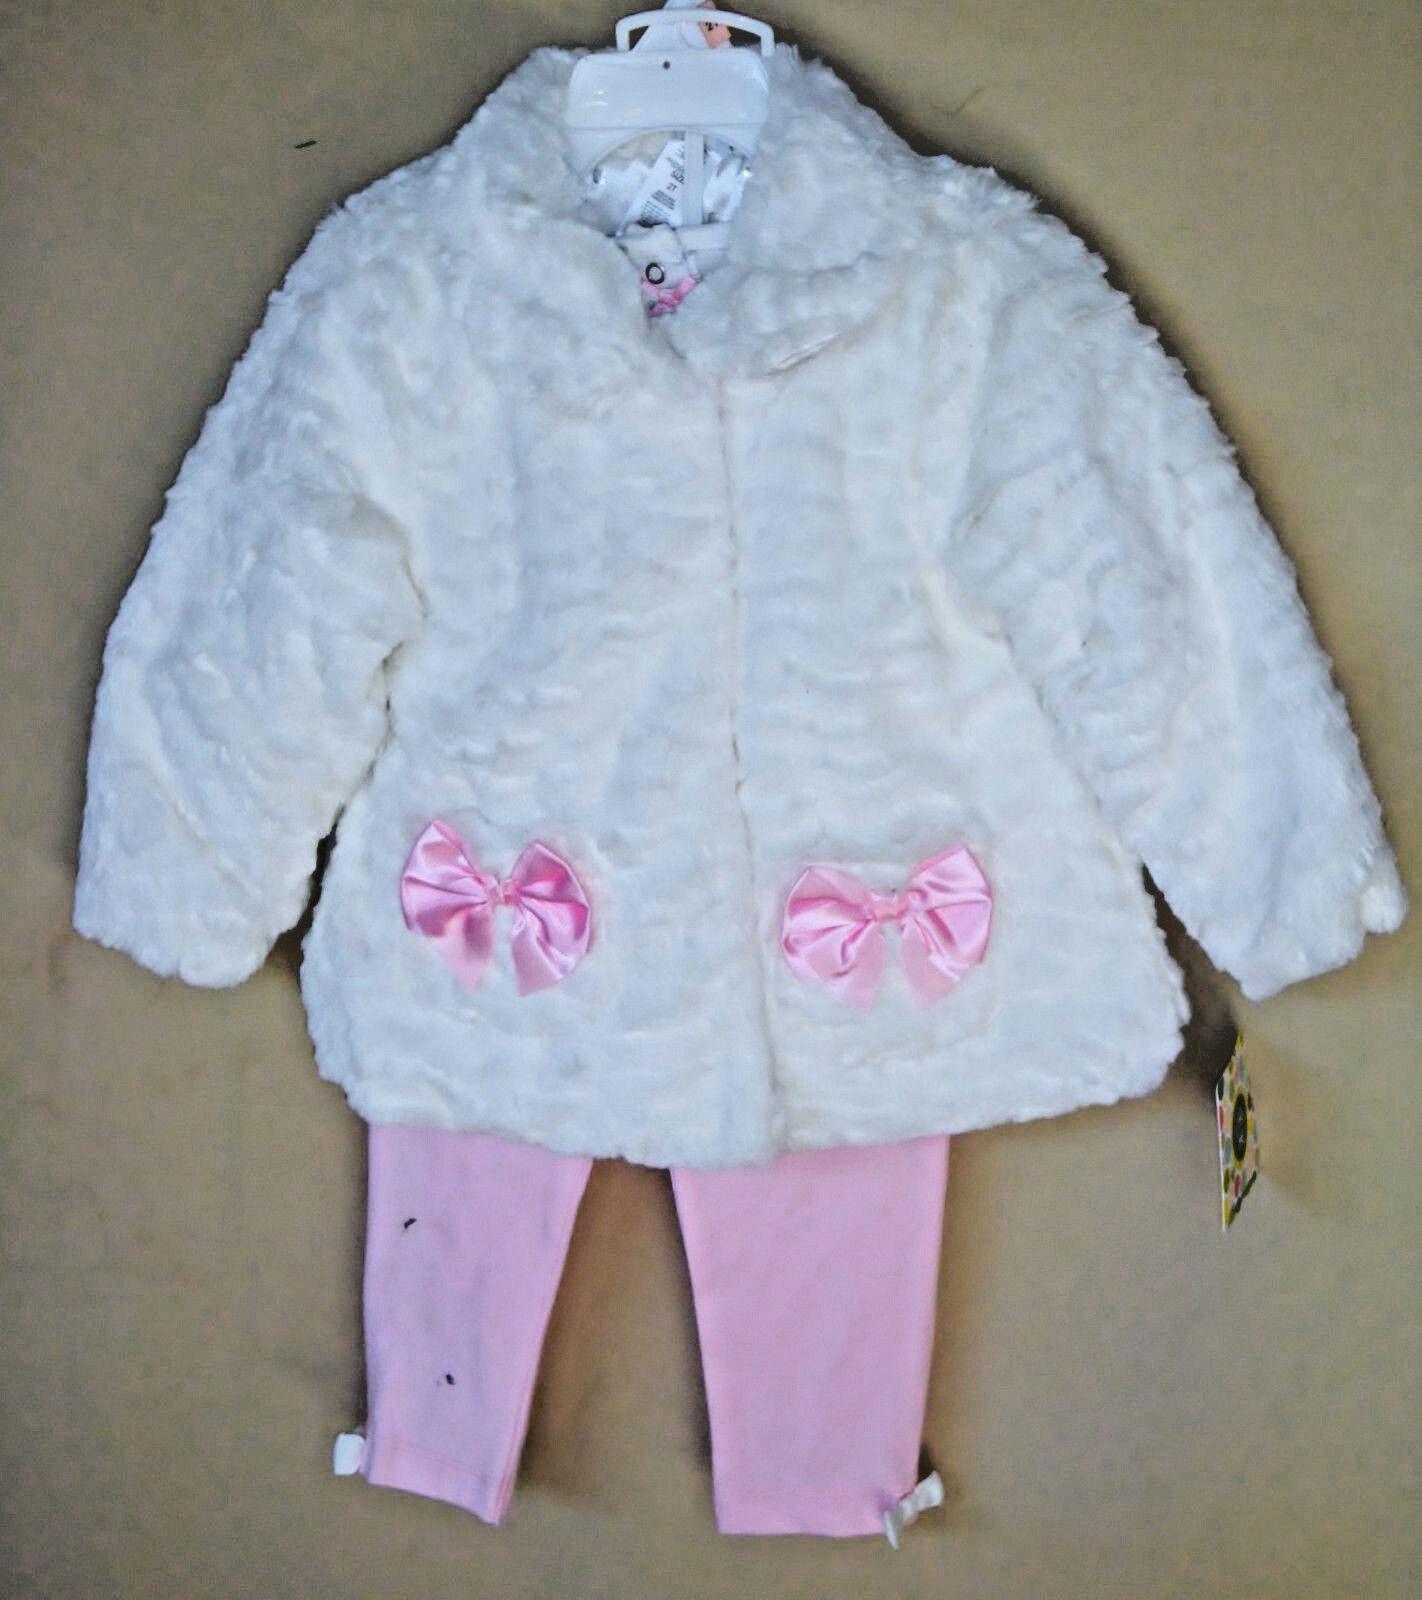 91700aac3 Little Me White Fur 3 PC Jacket Set W pink Leggings Girl Size 2 ...